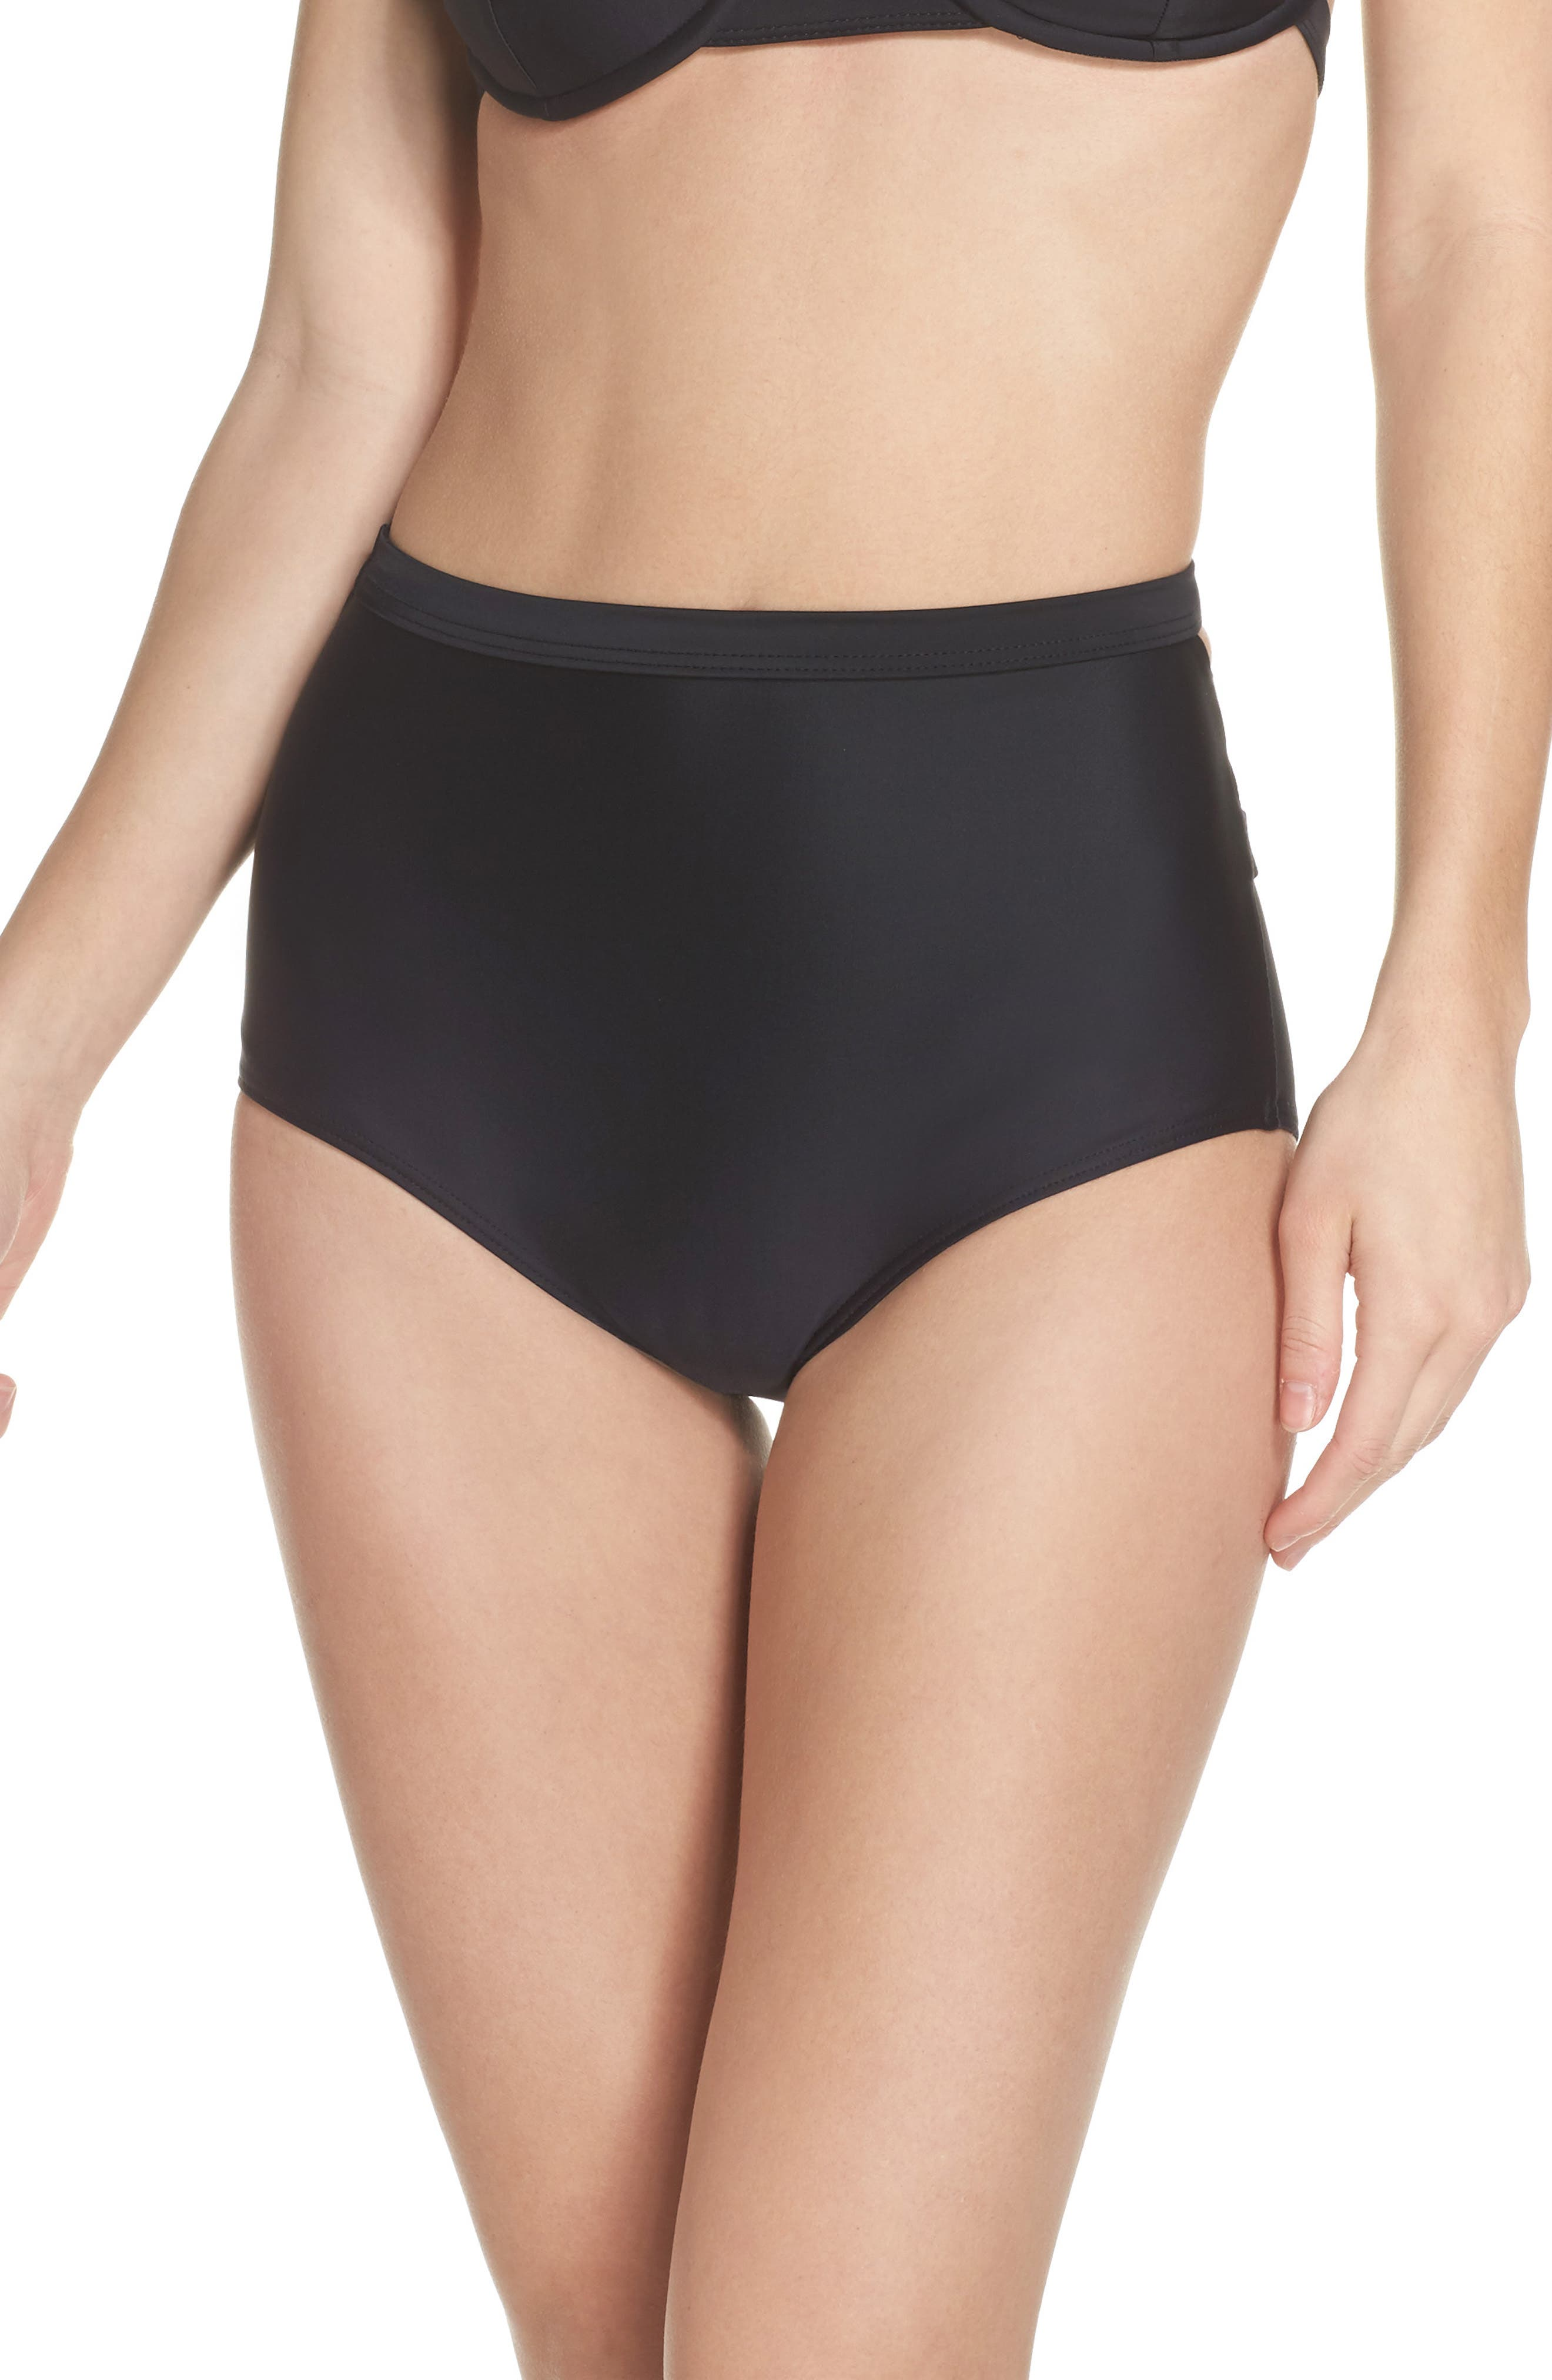 Bouloux II High Waist Bikini Bottoms,                         Main,                         color, Black